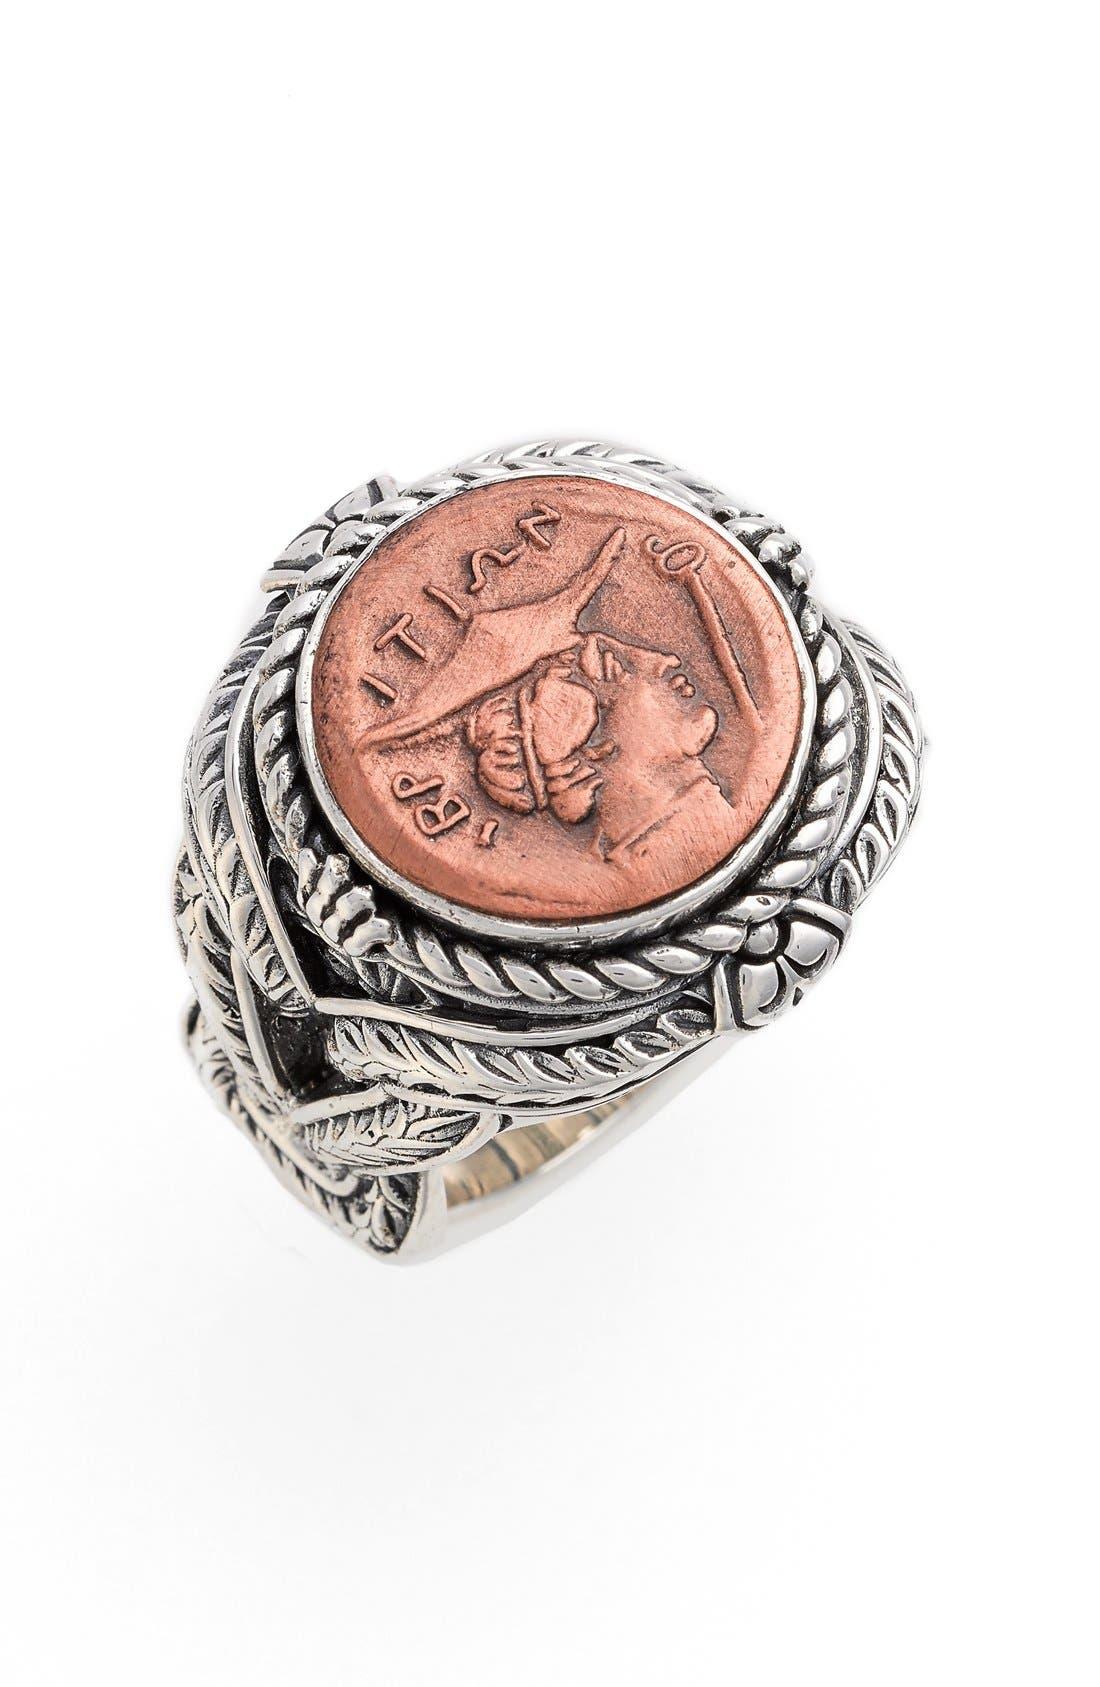 KONSTANTINO Aeolus - Hermes Coin Ring